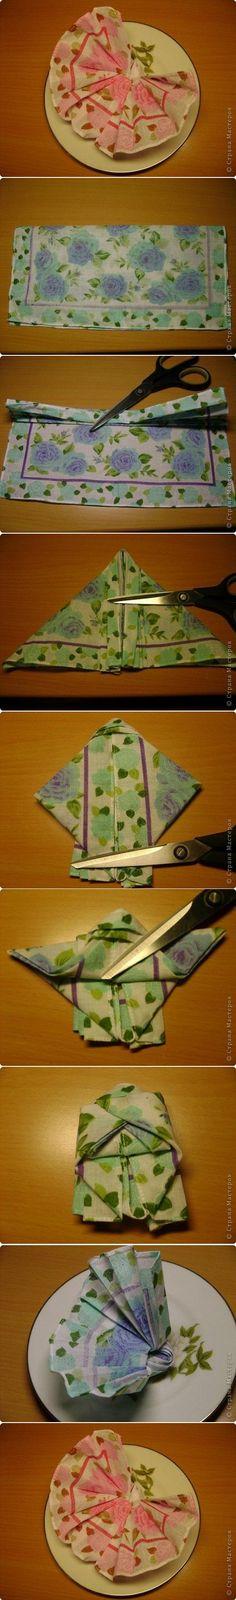 DIY Butterfly Napkin Fold | iCreativeIdeas.com Like Us on Facebook ==> https://www.facebook.com/icreativeideas